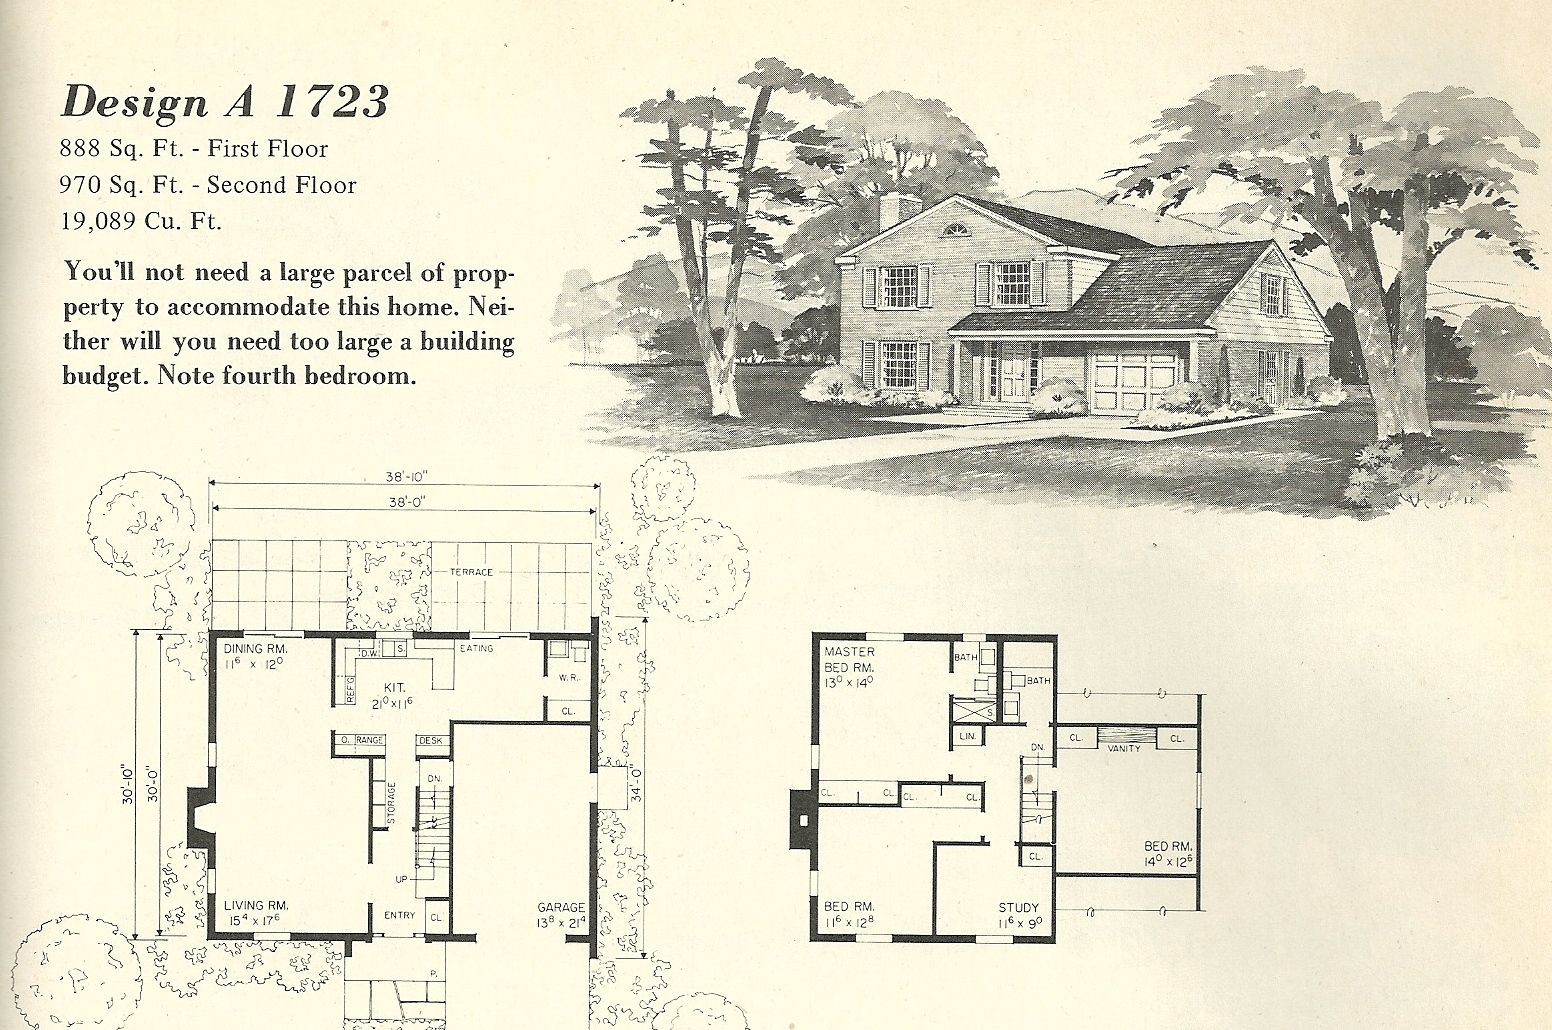 Beautiful Old Farm House Plans 12 Mid Century Modern Small House Plans House Plans With Pictures Vintage House Plans Vintage House